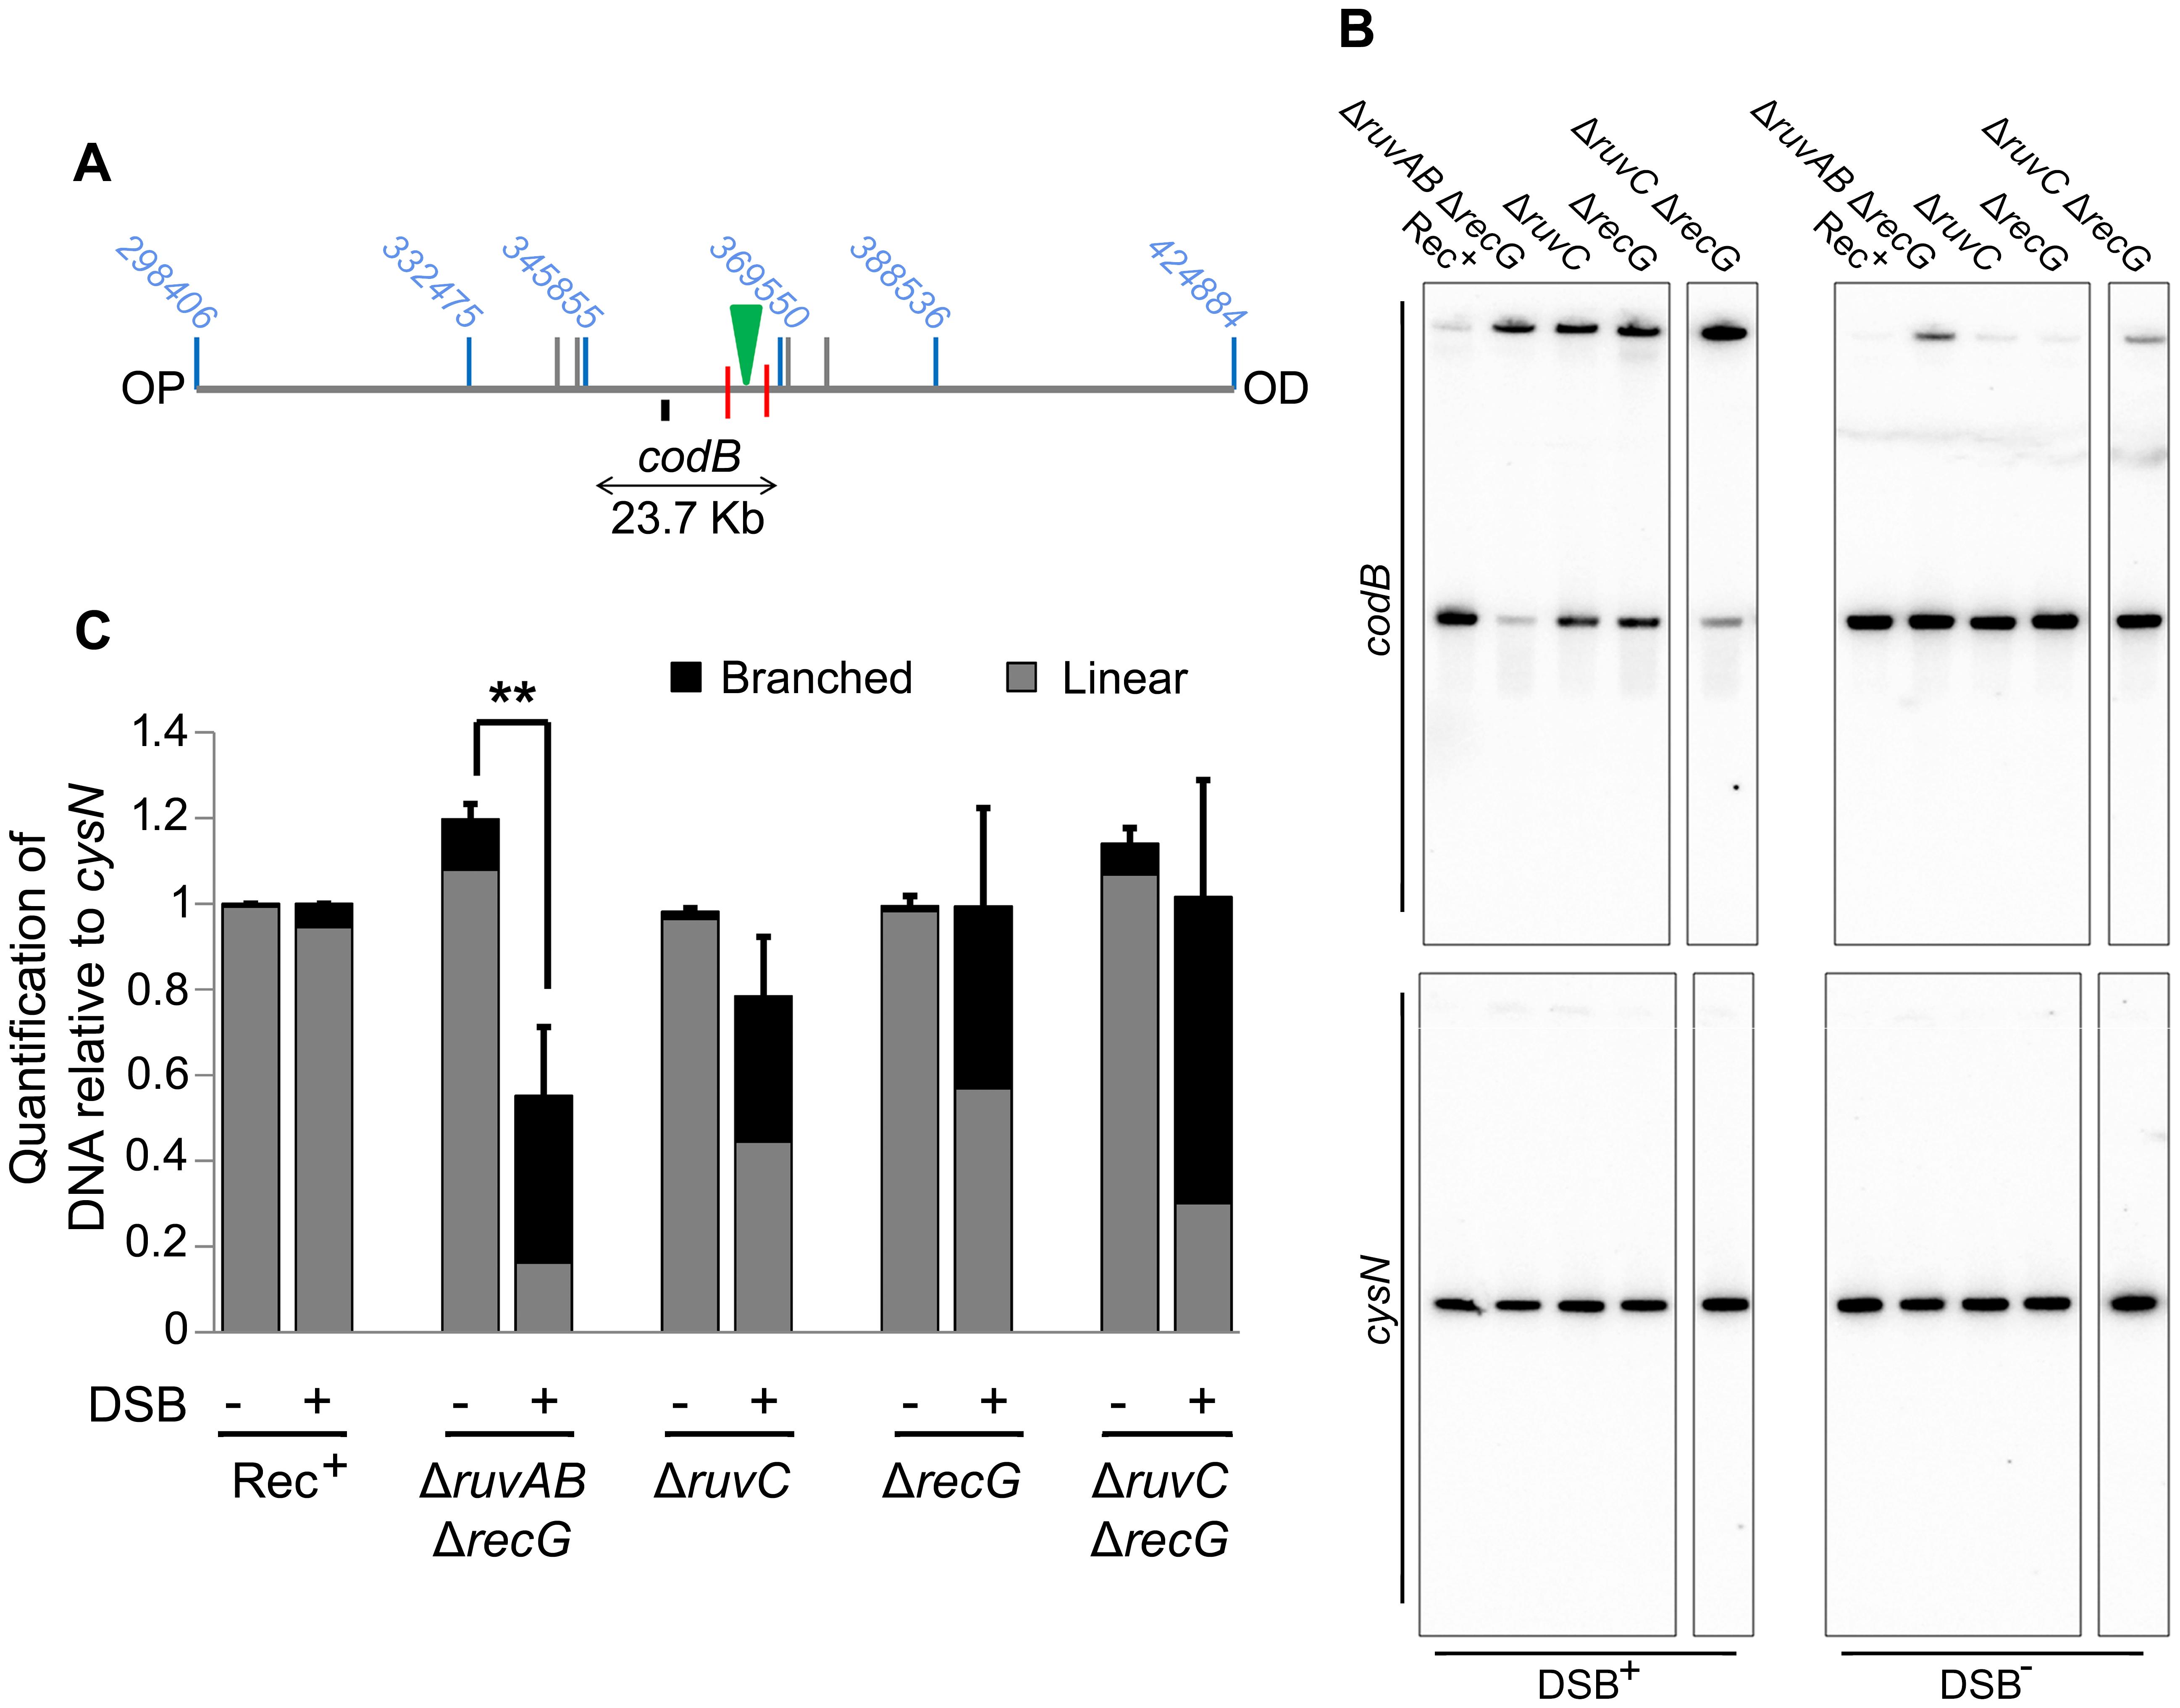 Detection of DNA loss in Δ<i>ruvAB</i> Δ<i>recG</i> and Δ<i>ruvC</i> Δ<i>recG</i> mutants.